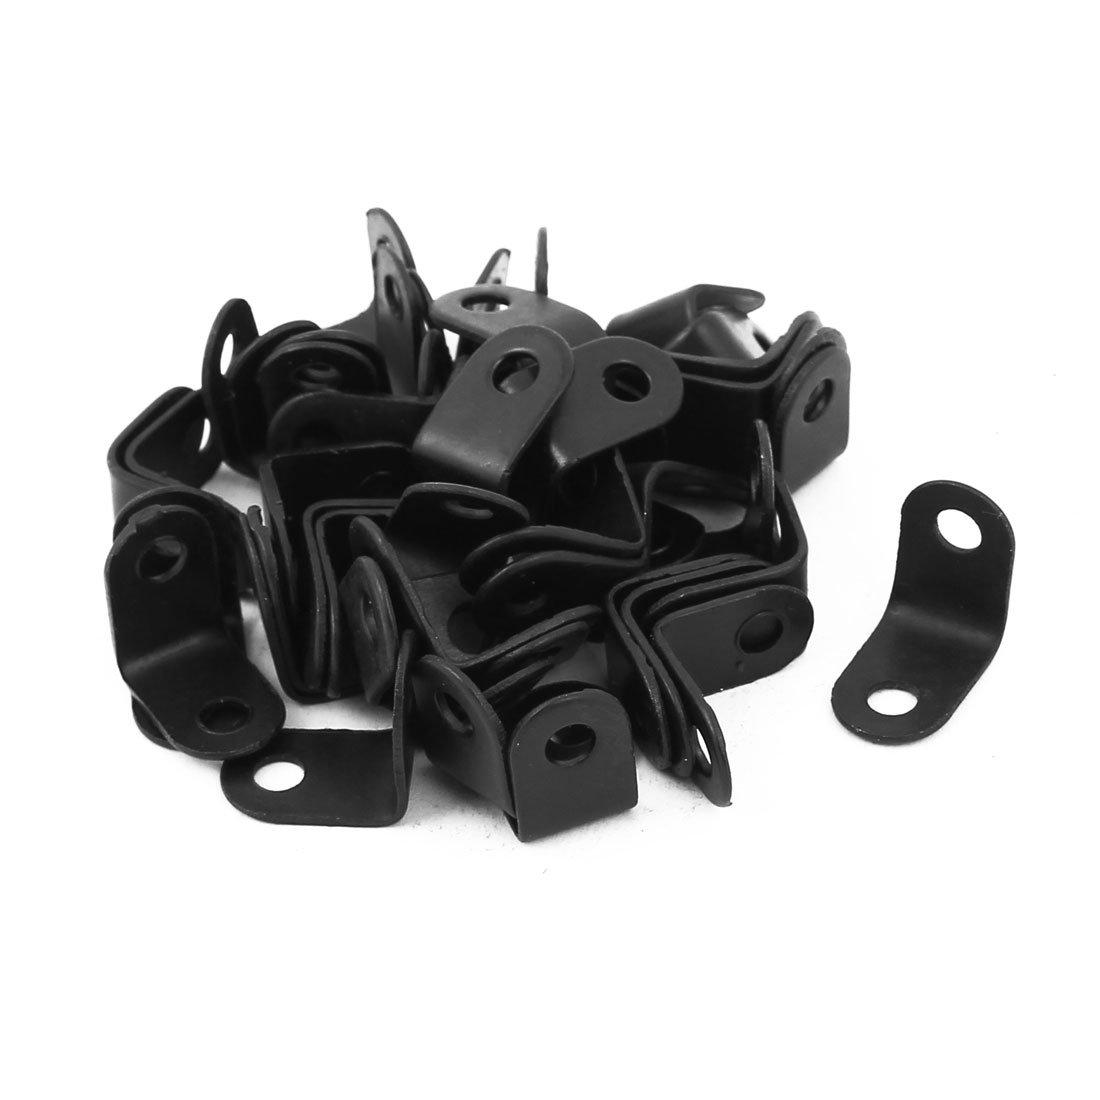 uxcell 16mmx10.5mmx16mm 90 Degree Metal Angle Brackets Corner Braces Black 50pcs